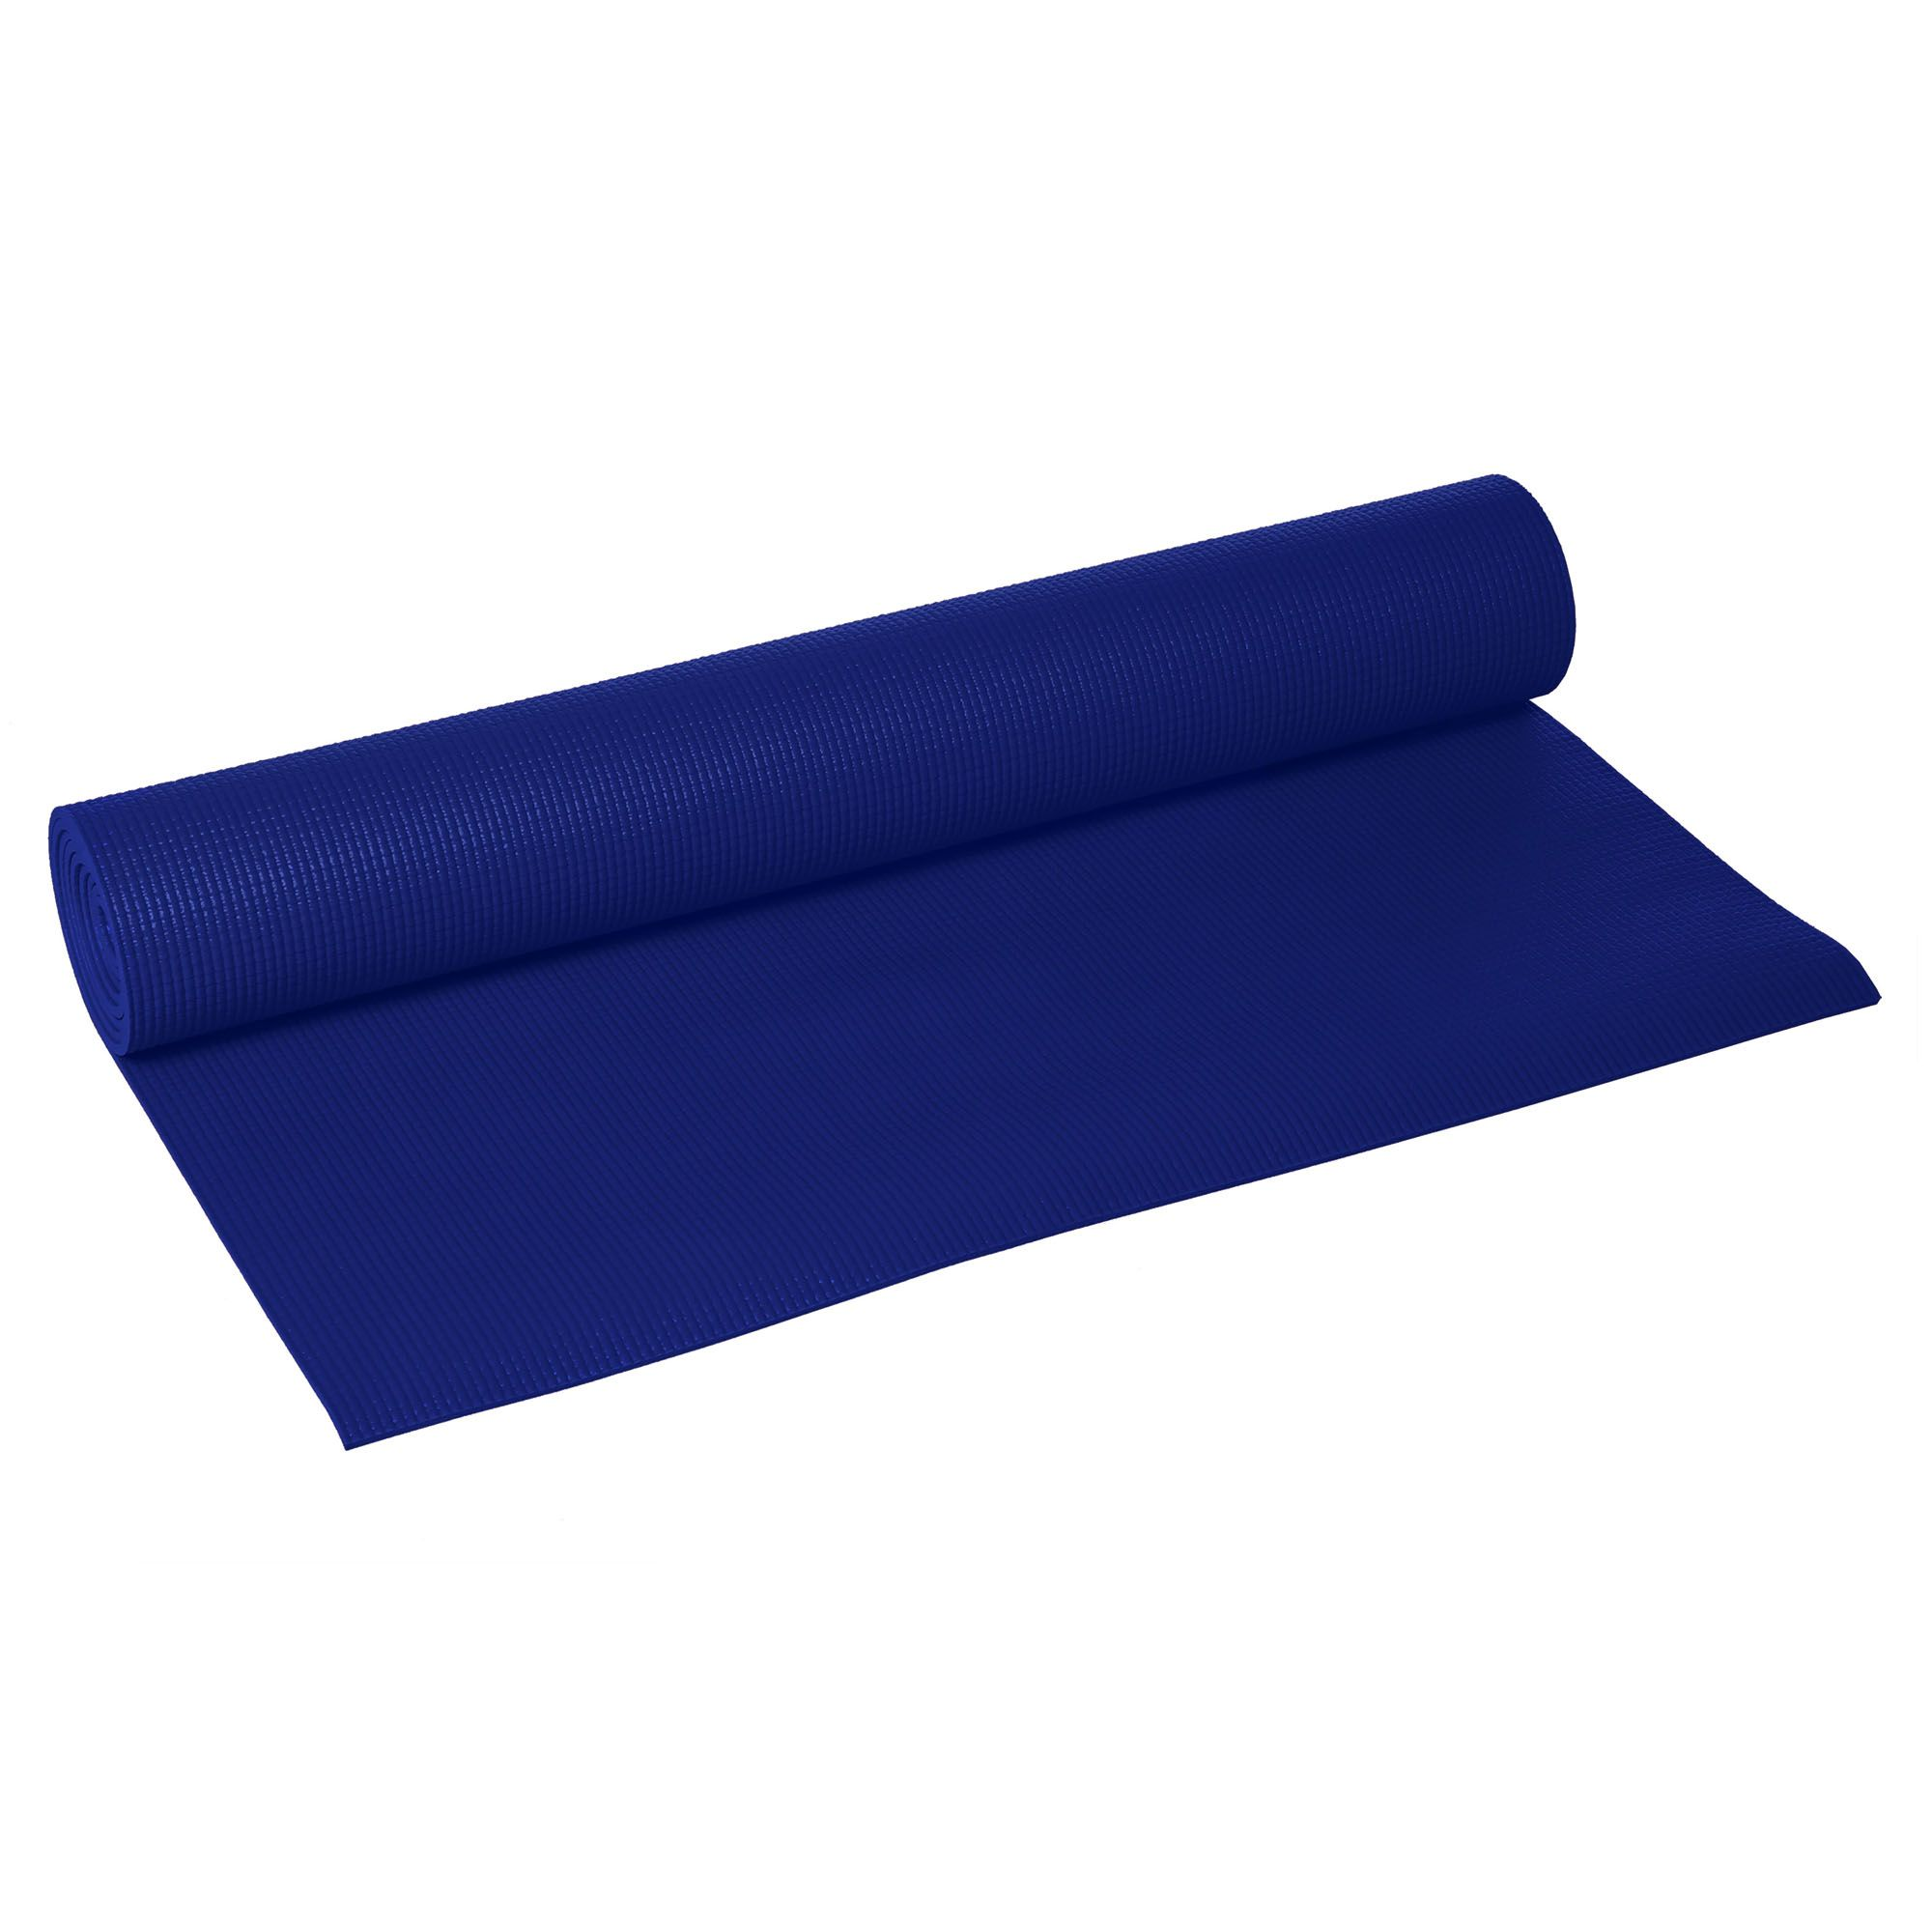 Lotus Design Trend 6mm Yoga Mat